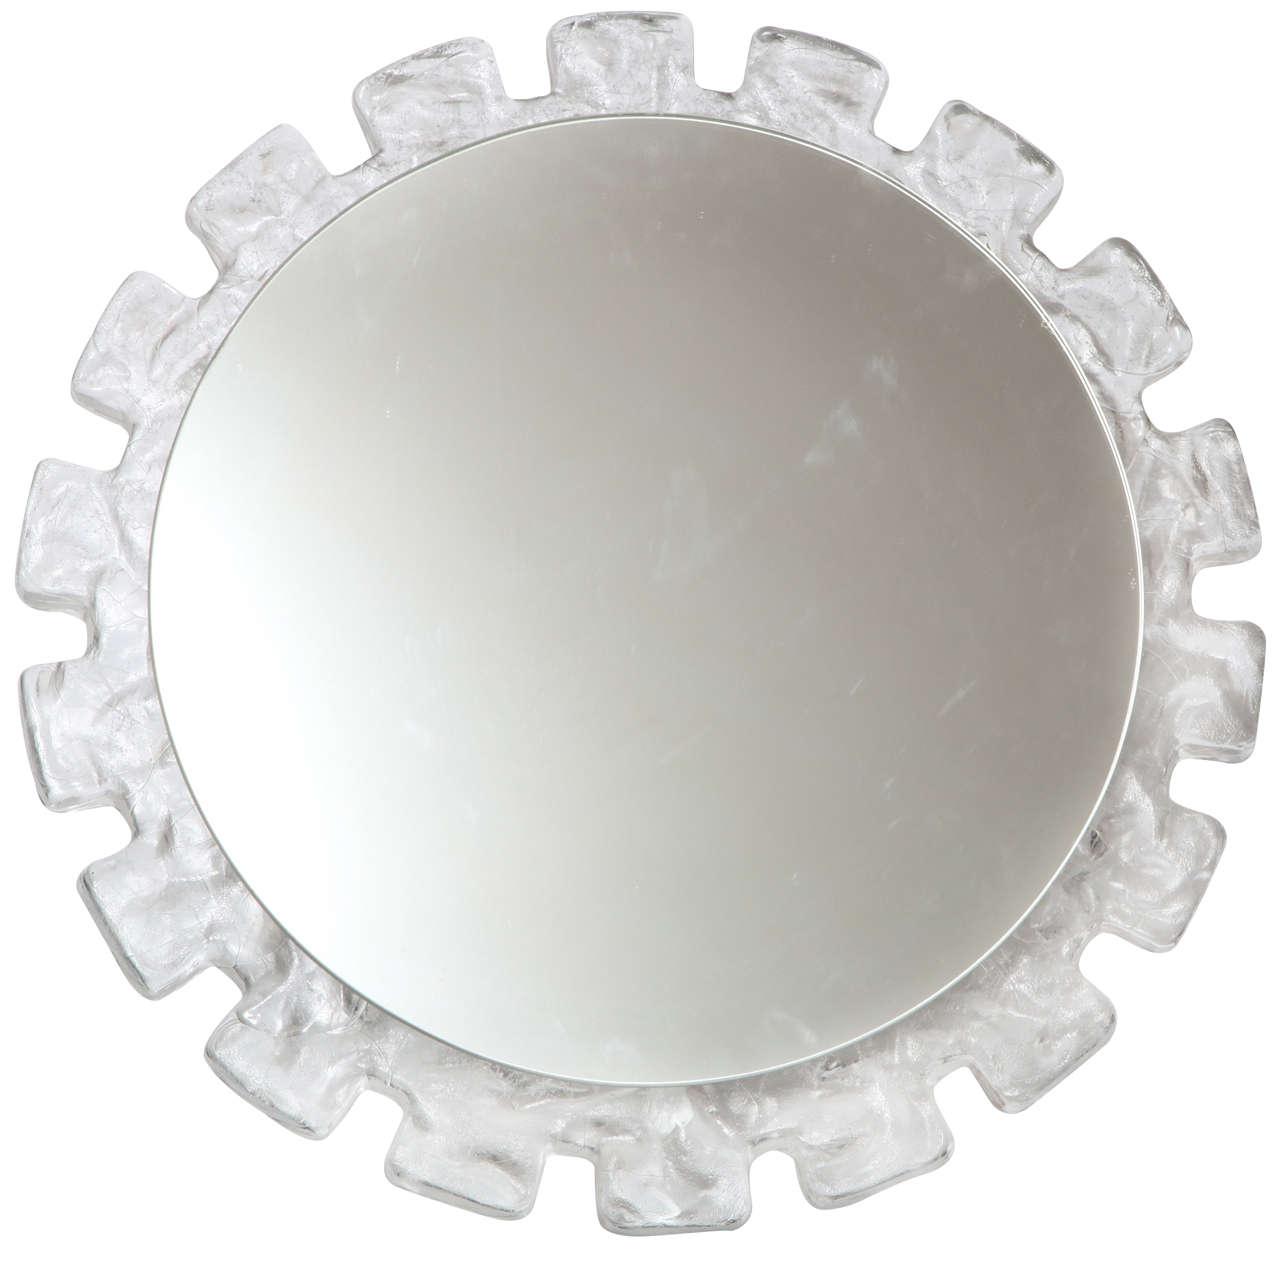 Illuminated Circular Mirror with Molded Surround